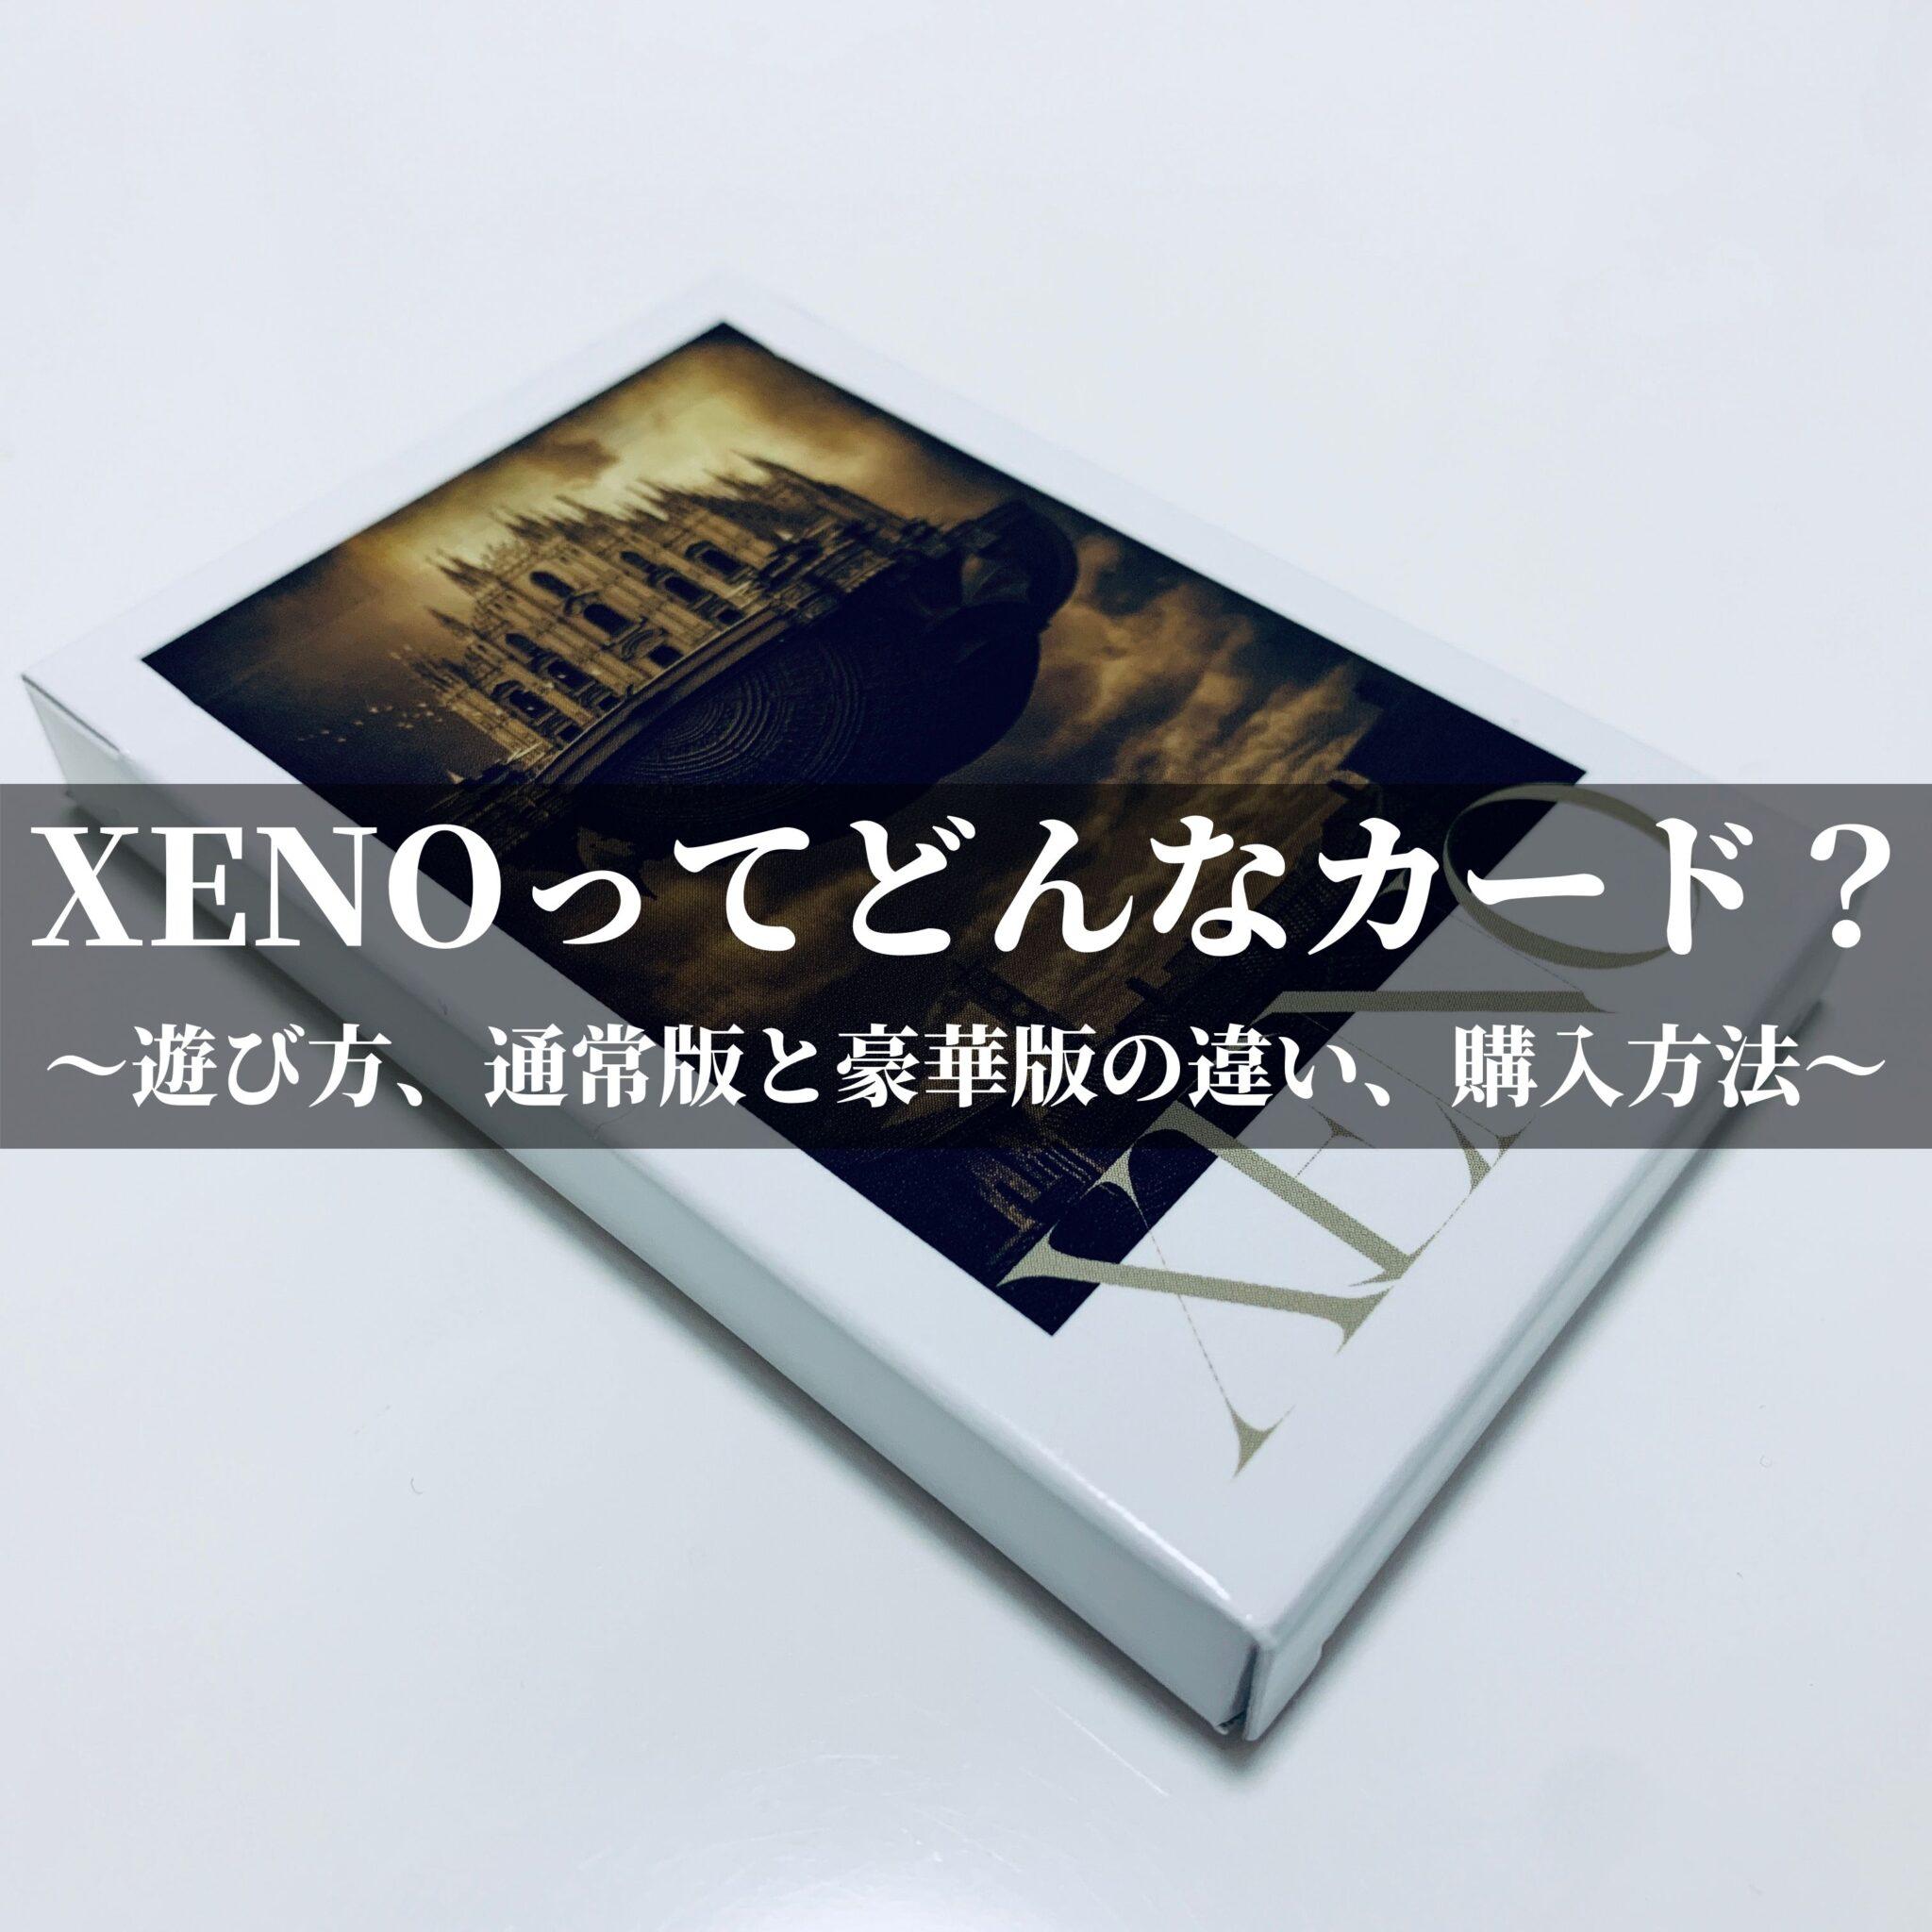 XENOってどんなカード?〜遊び方、通常版と豪華版の違い、購入方法〜